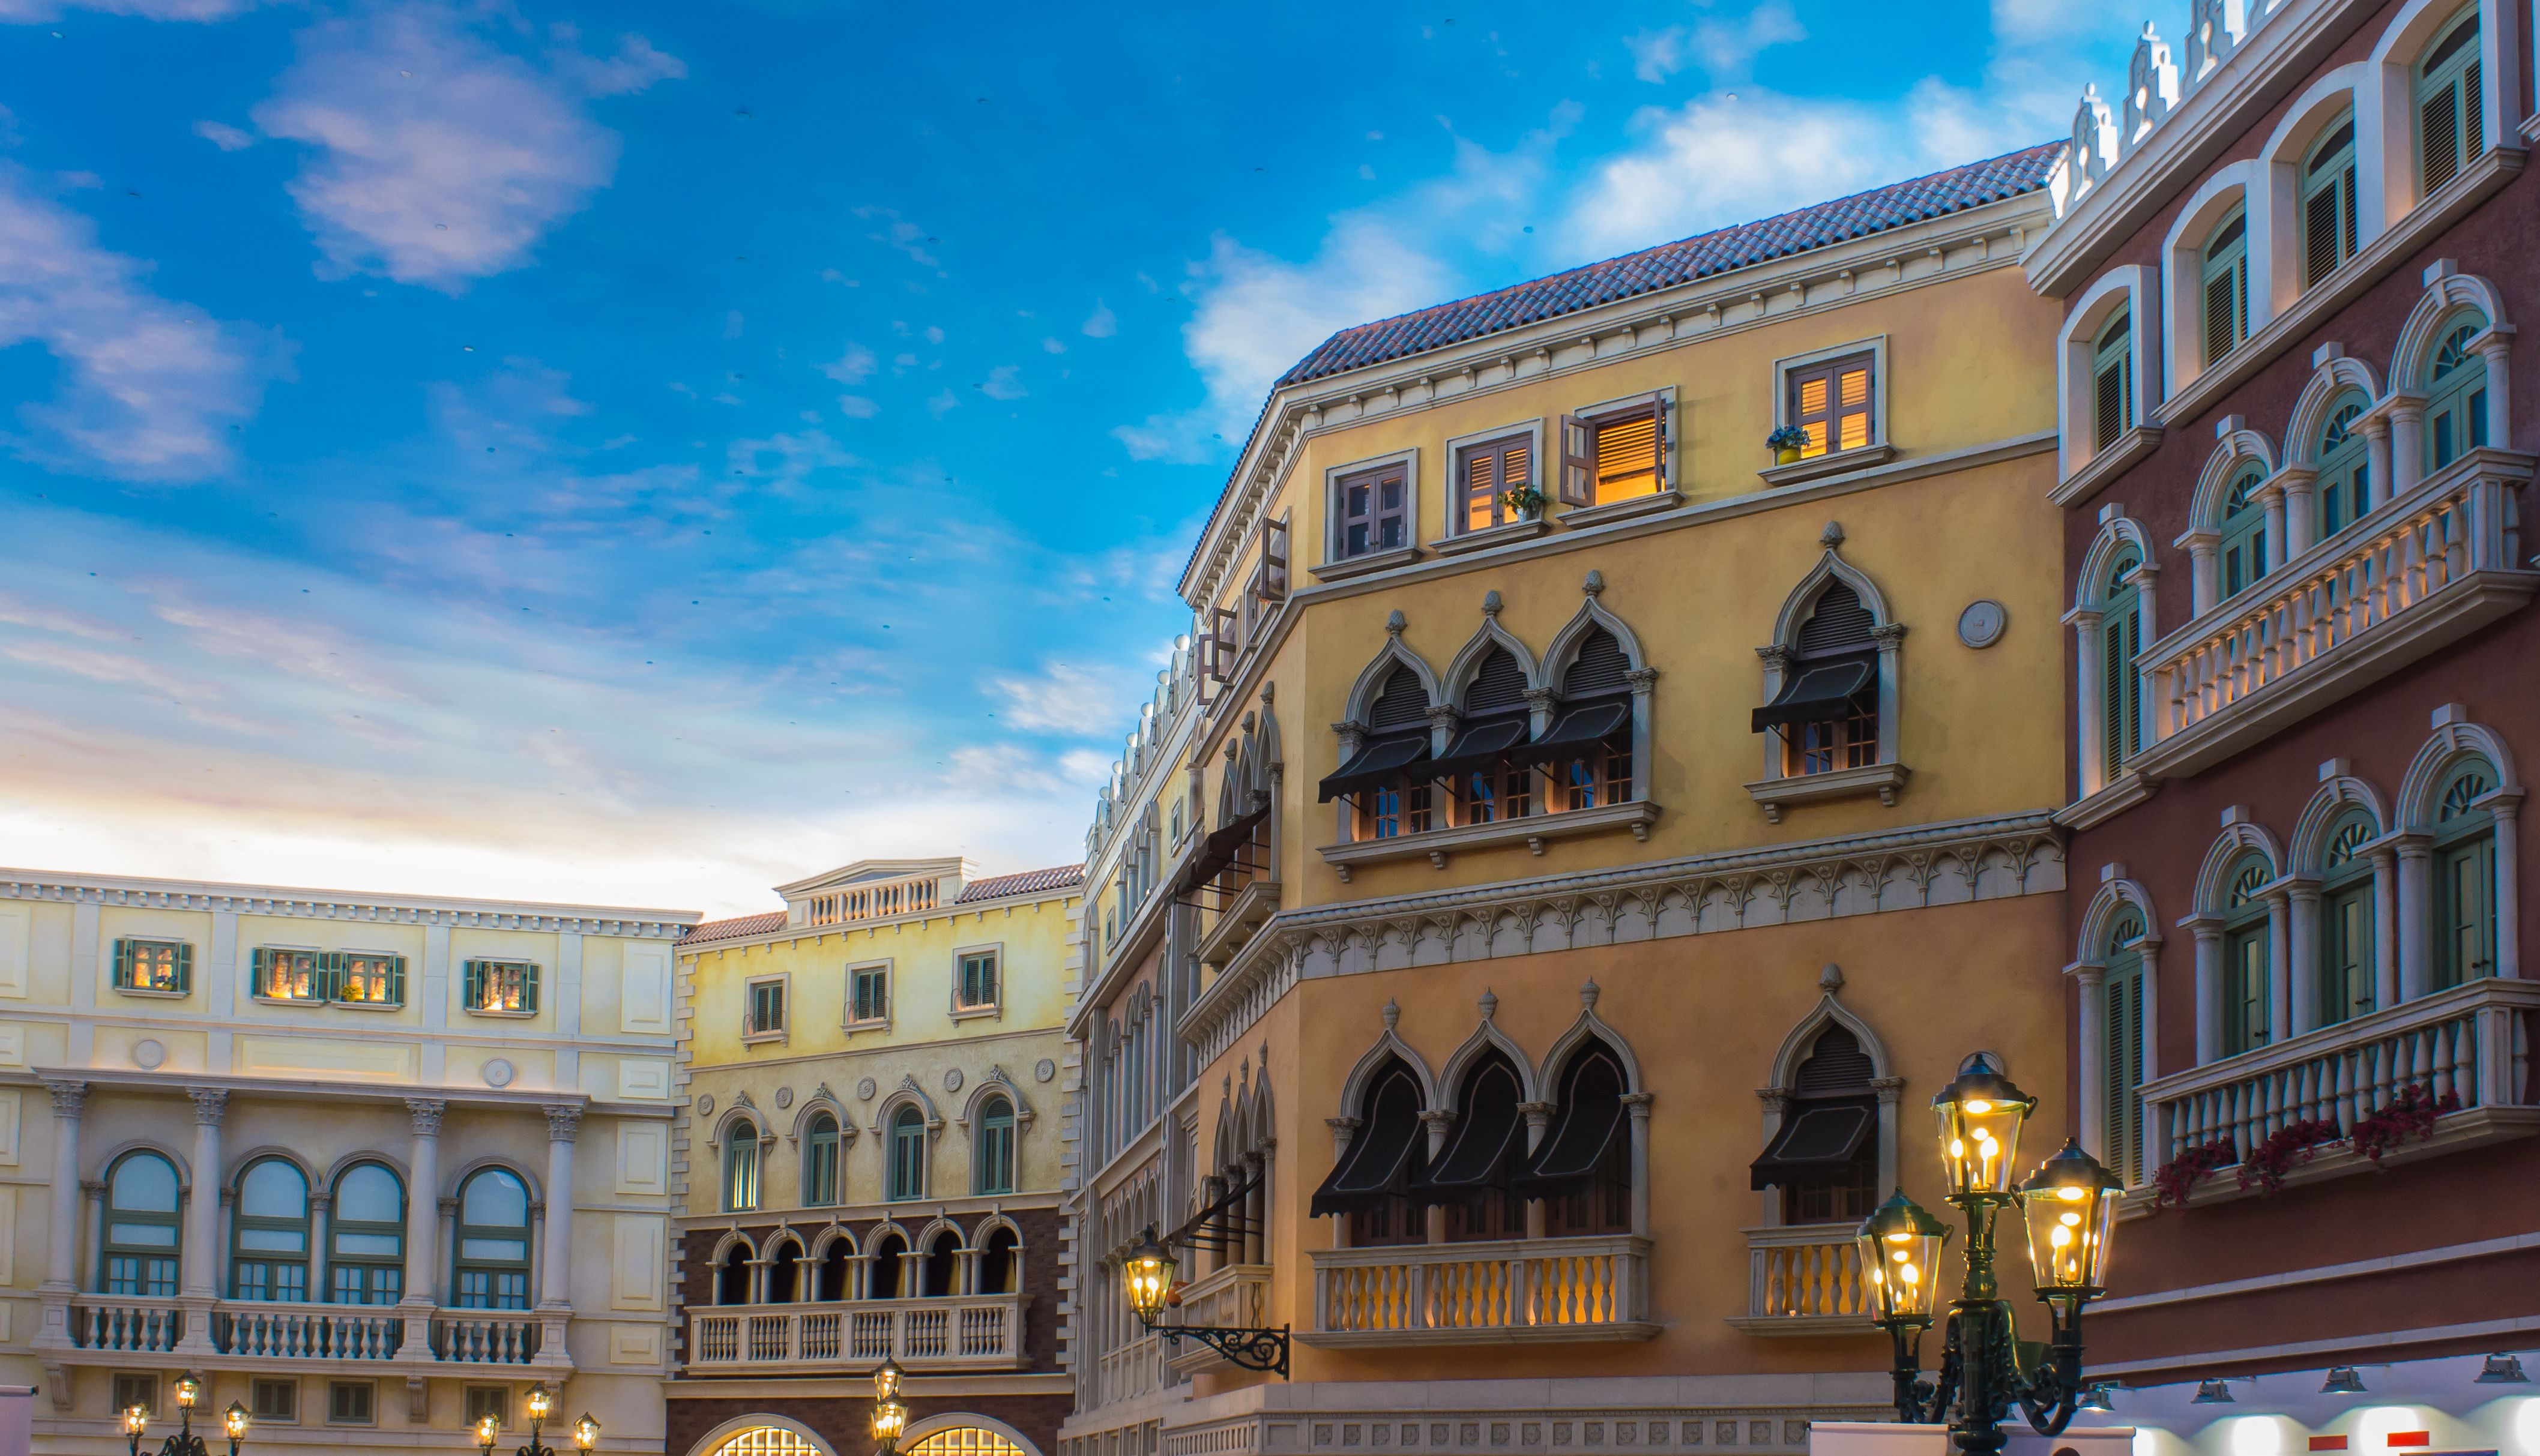 The Venetian Hotel, Macao